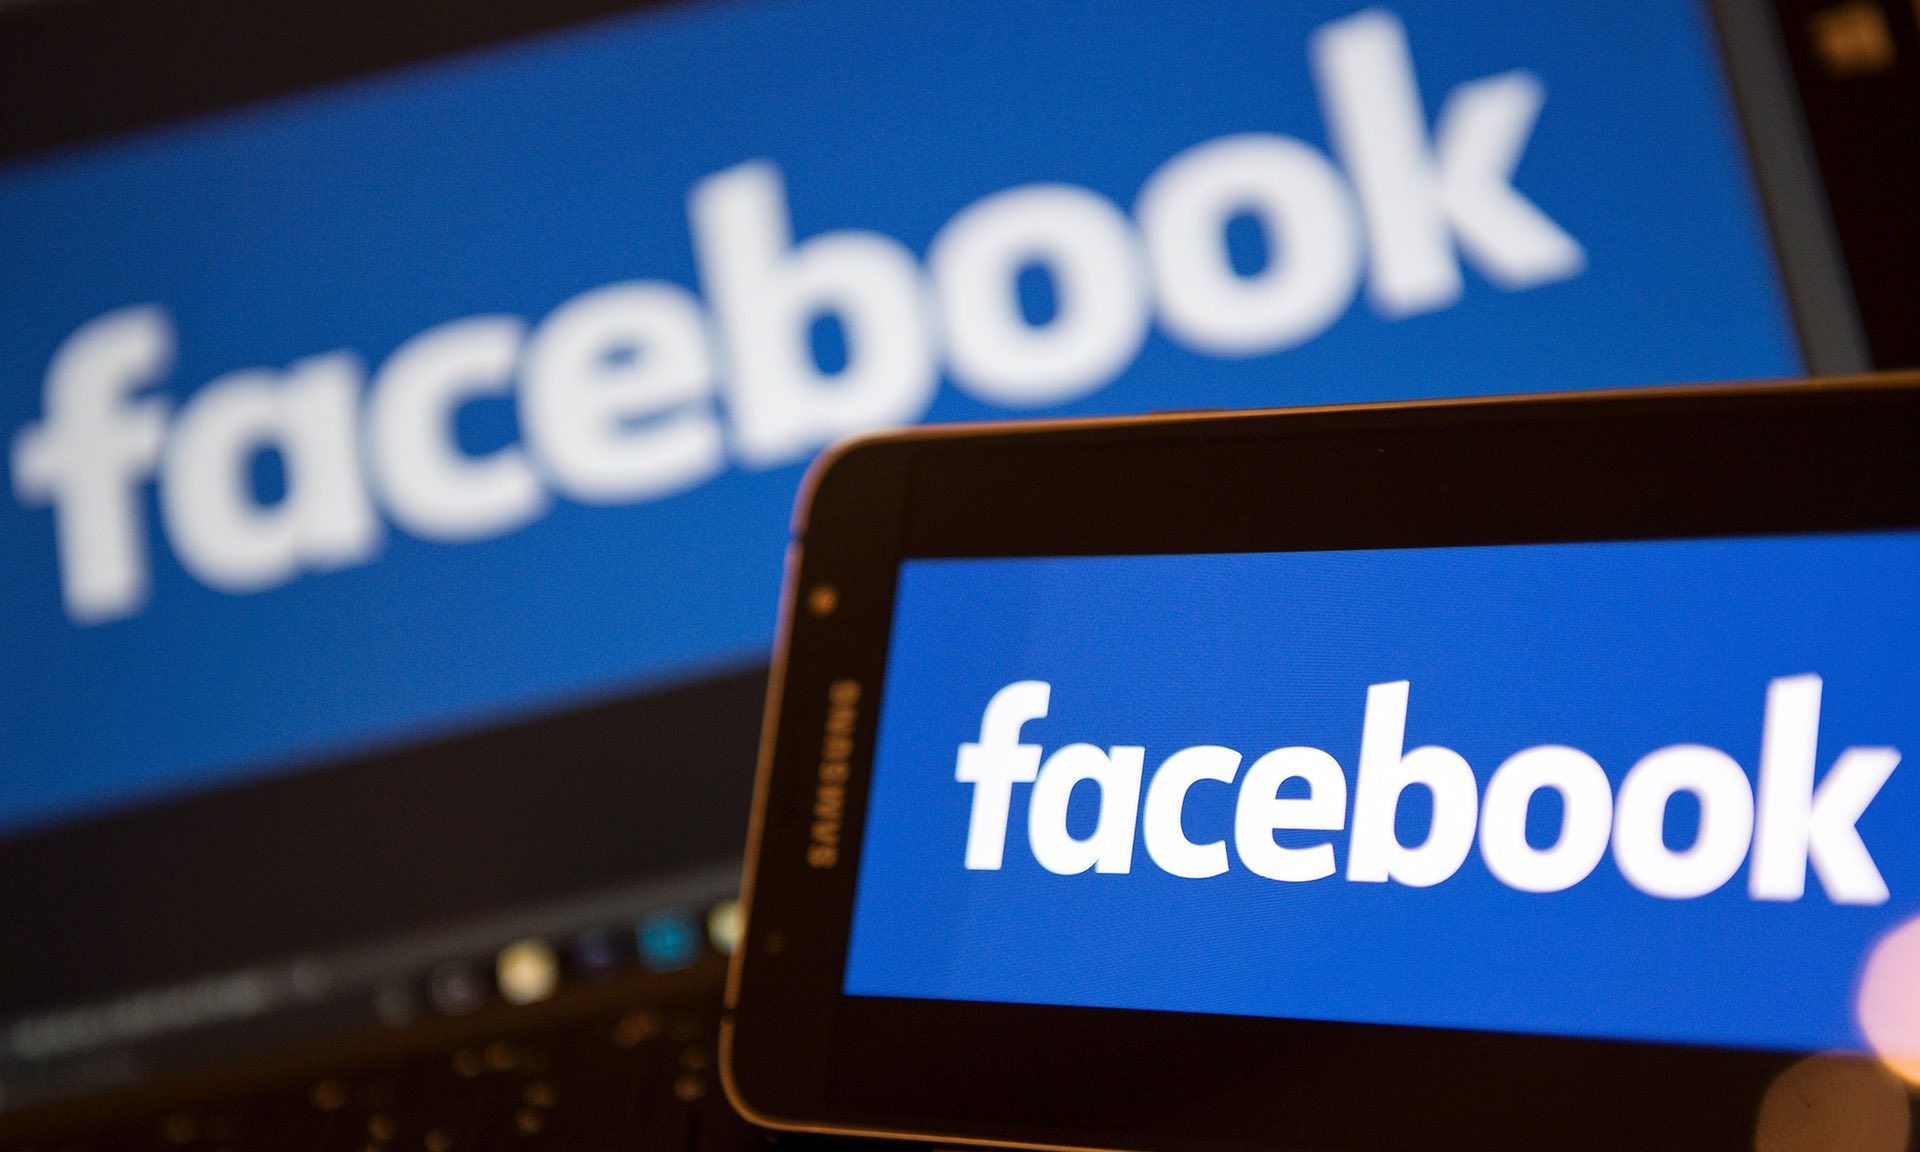 Didenda Karena Like Facebook 2